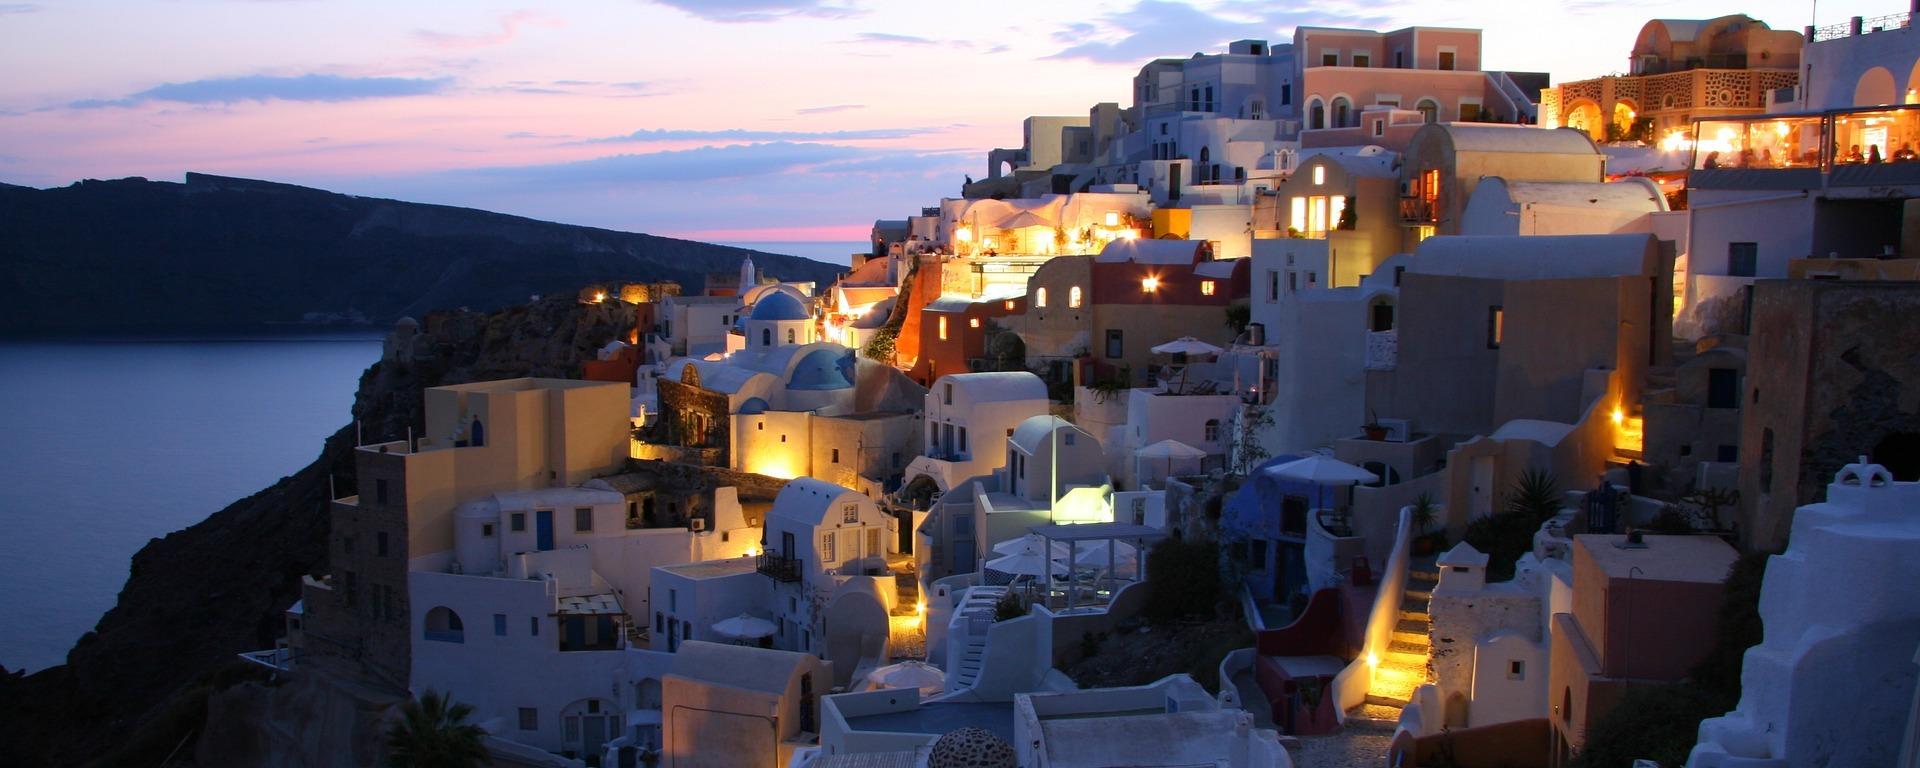 santorini,island,greece,cyclades,greek island,white houses,caldera,vacations,tourism,blue,abendstimmung, Ithaka, DON CHARISMA